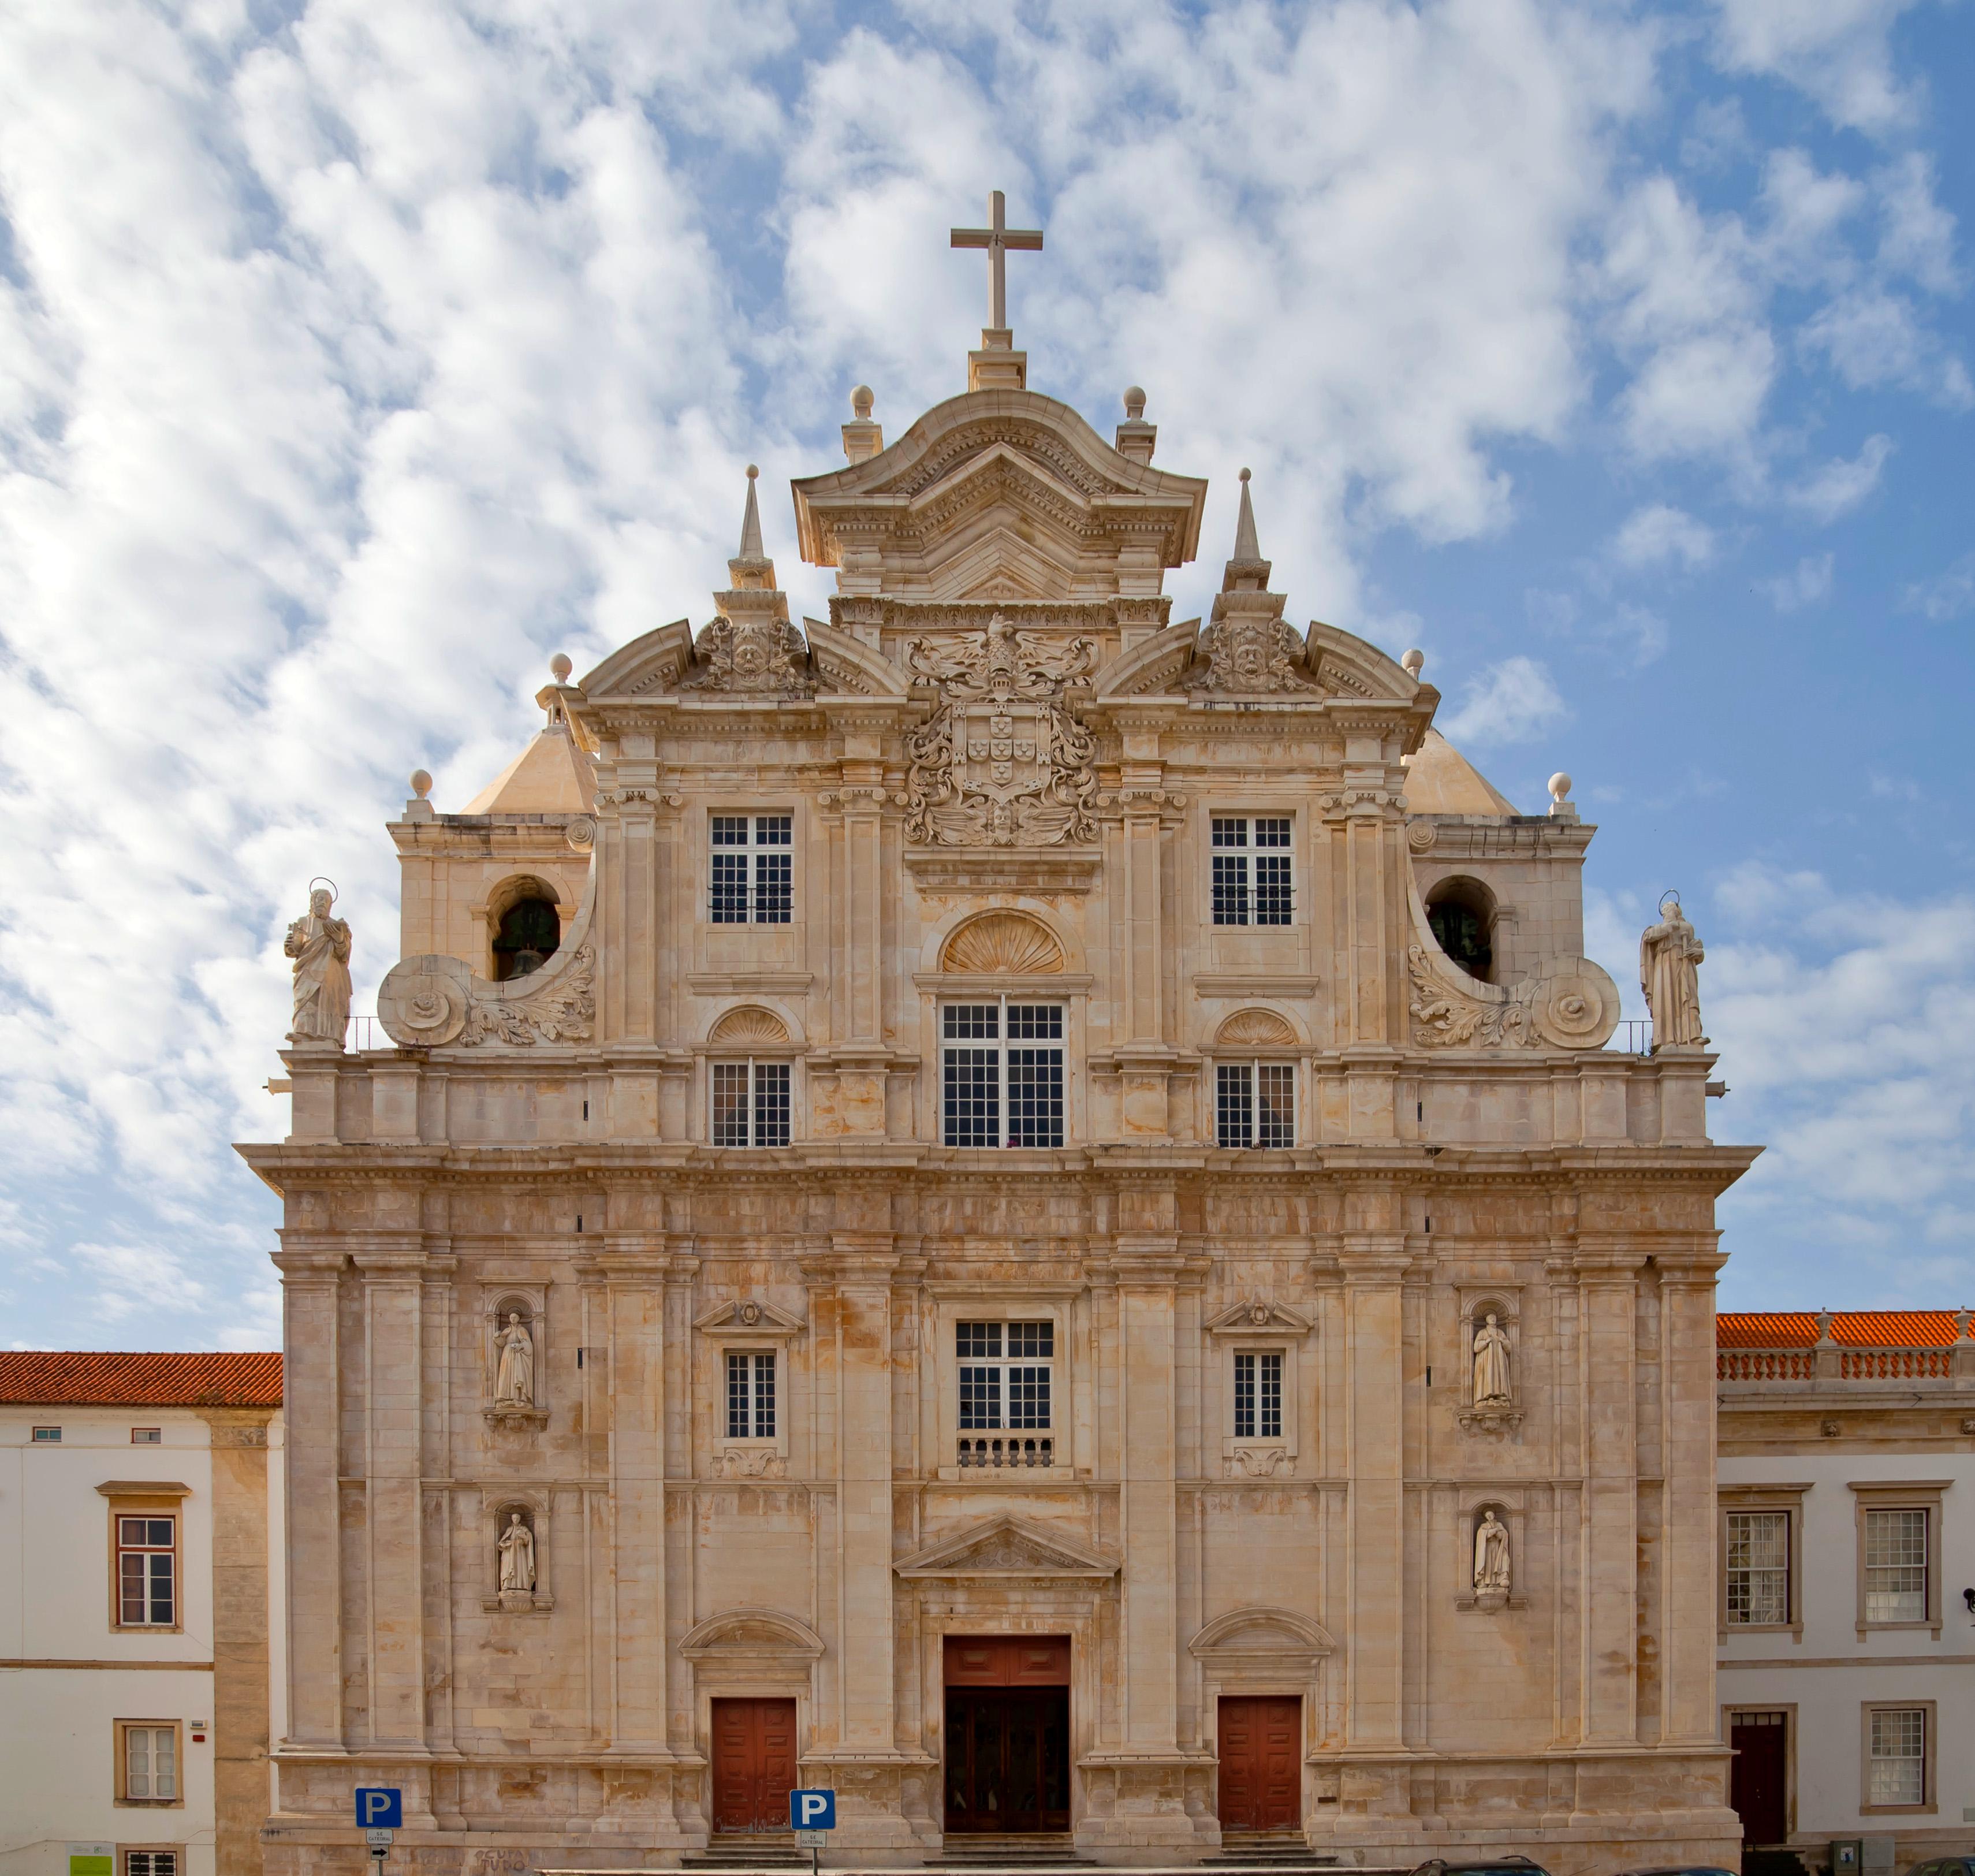 File:Catedral Nueva, Coímbra, Portugal, 2012-05-10, DD 01.JPG - Wikimedia Com...